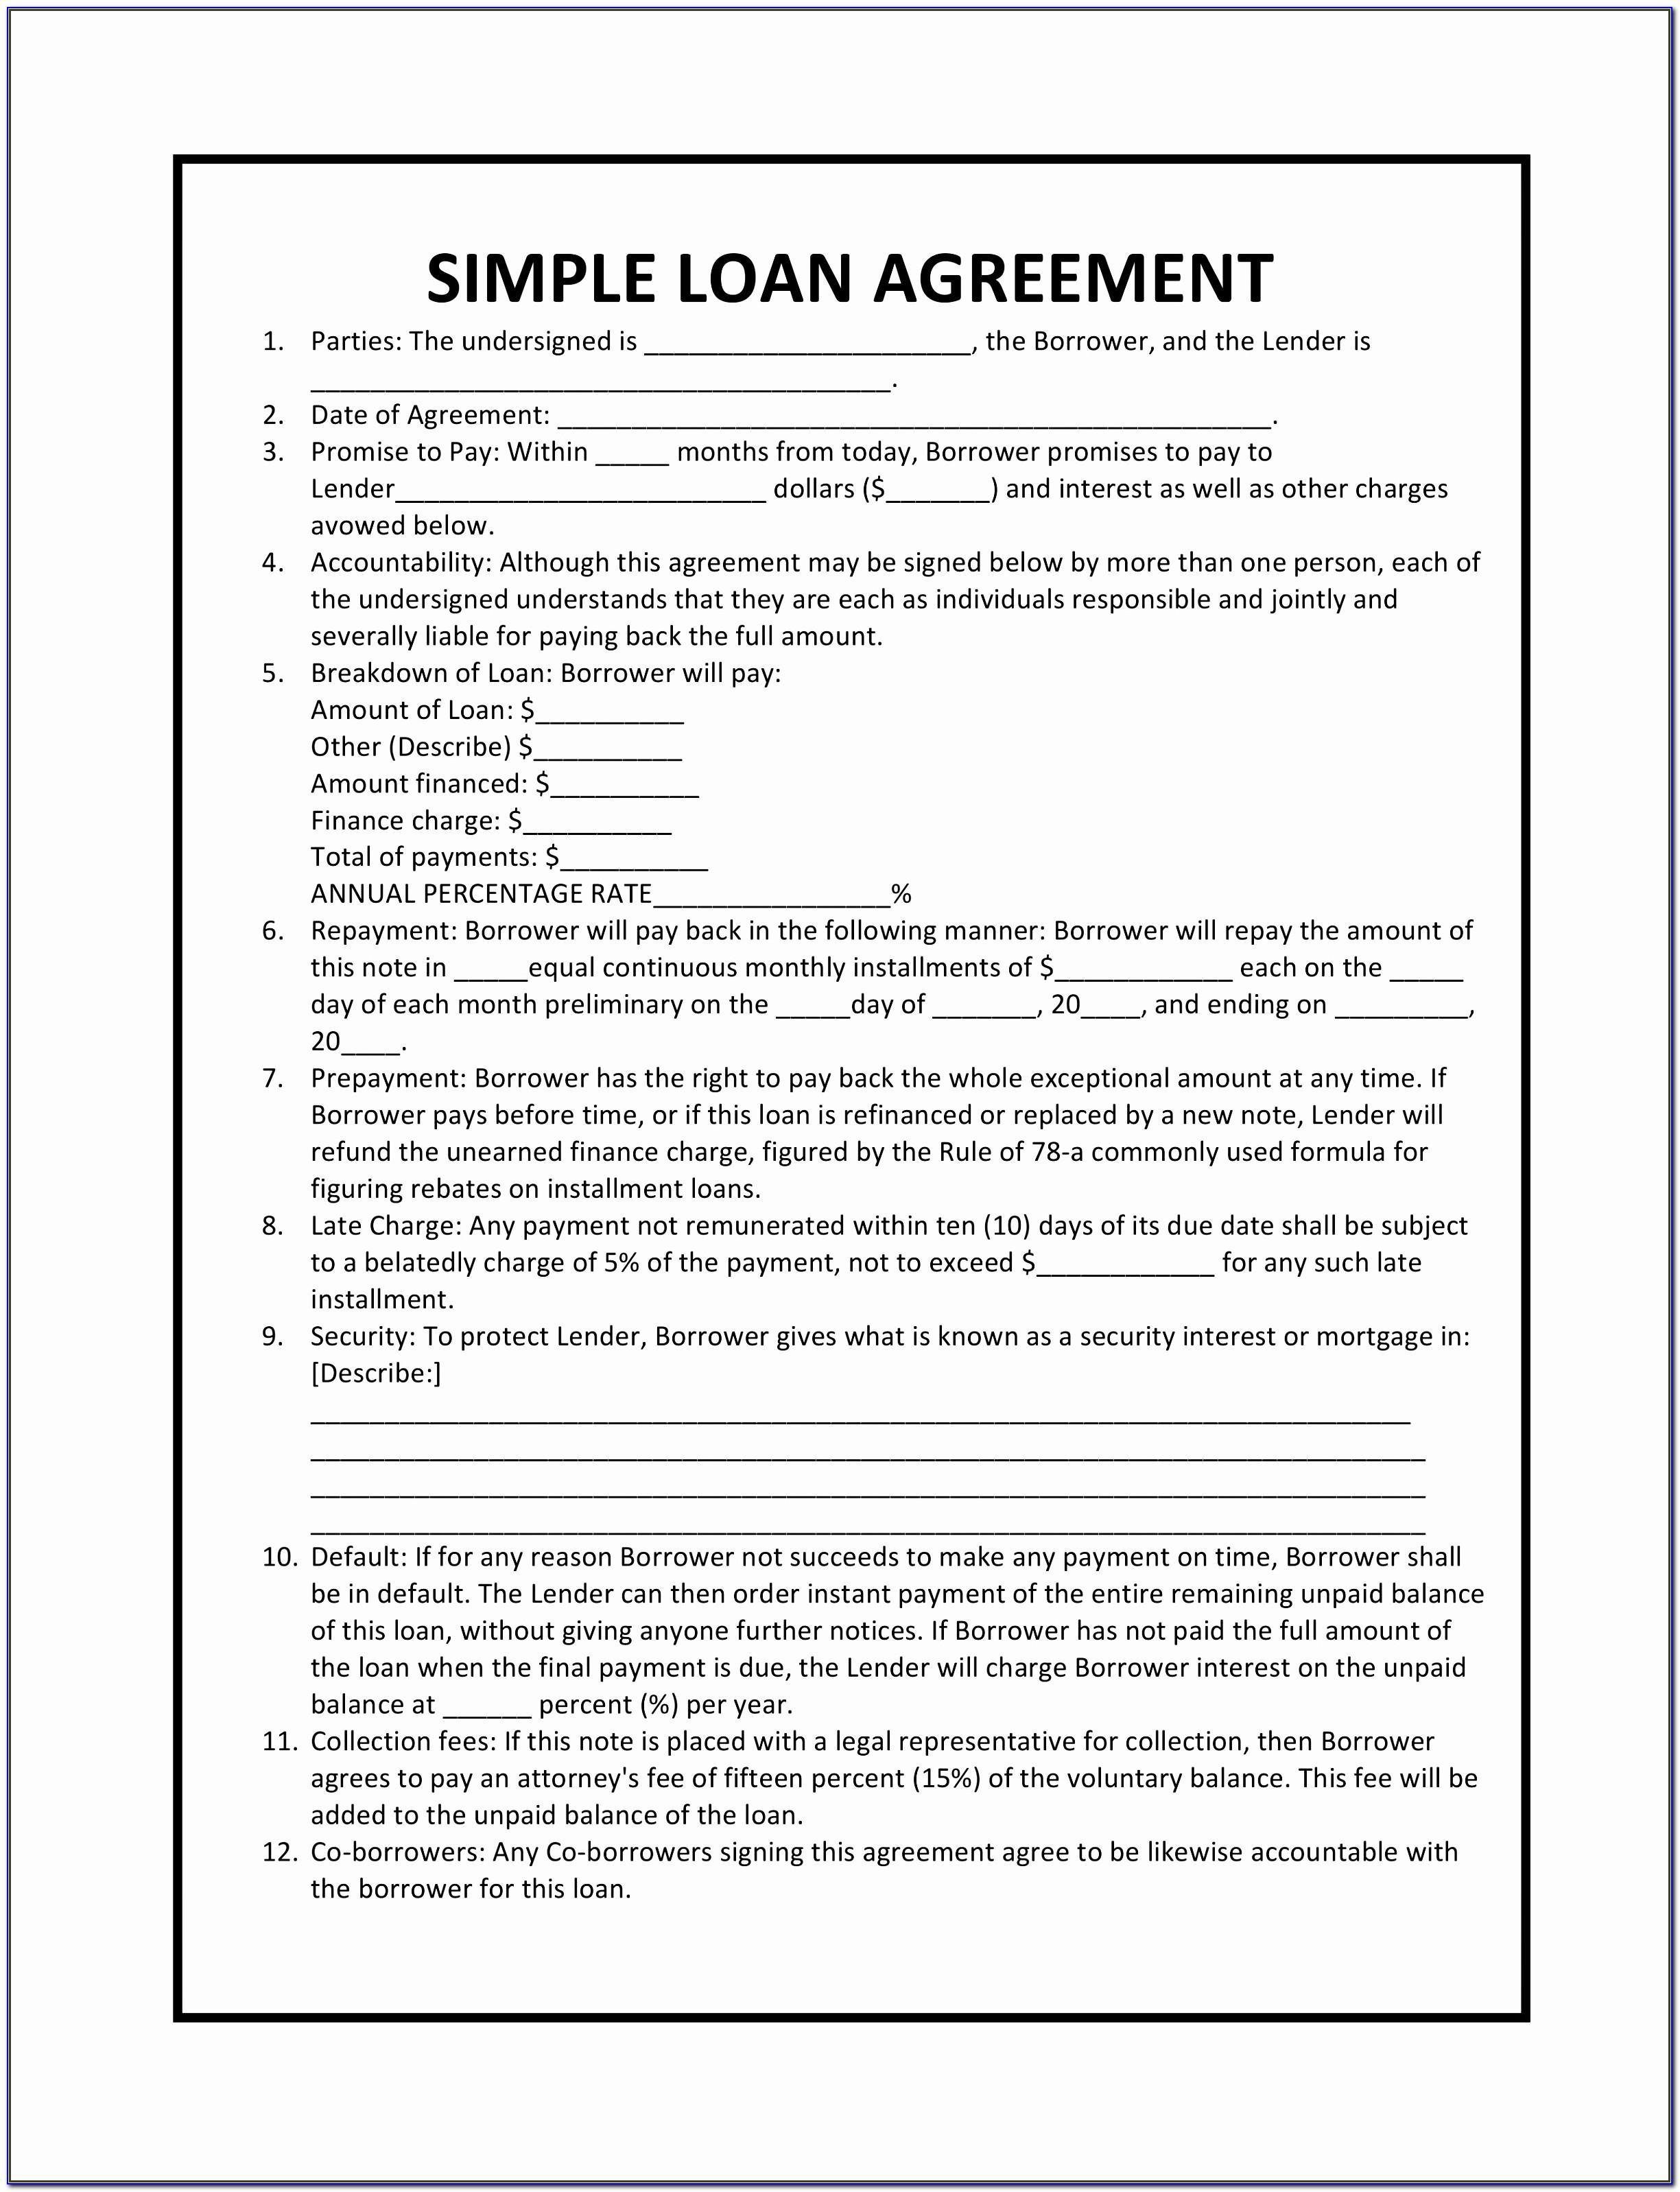 Simple Loan Agreement Template Singapore